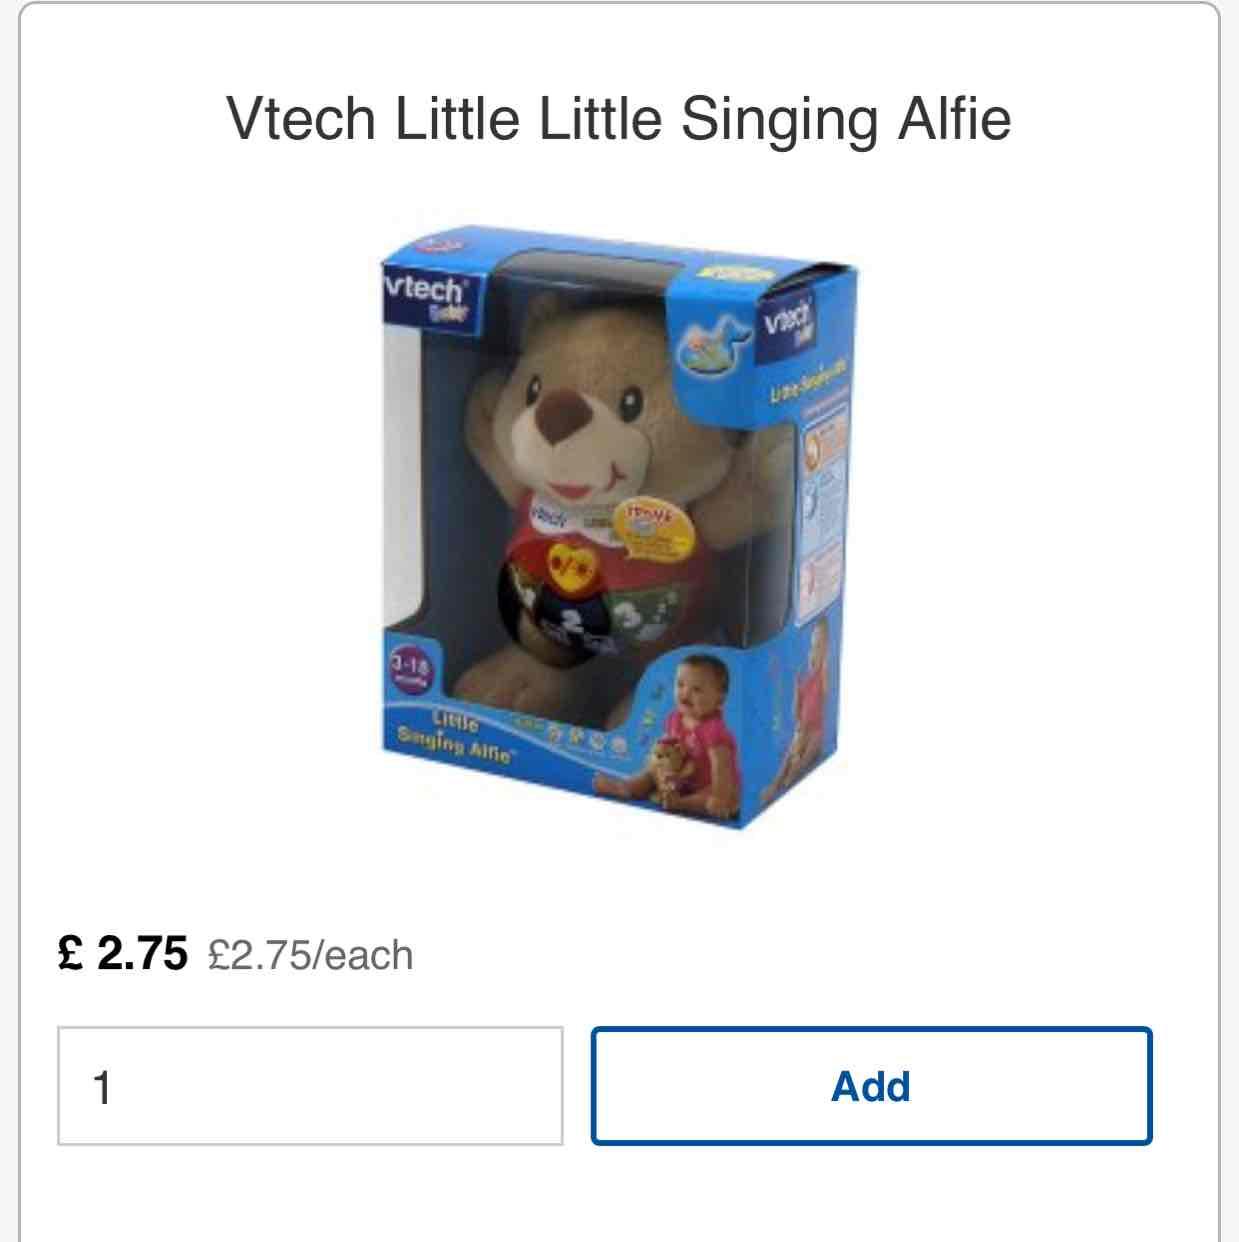 Vtech Little Singing Alfie £2.75 @ Tesco - (Conley hatch lane) / Online